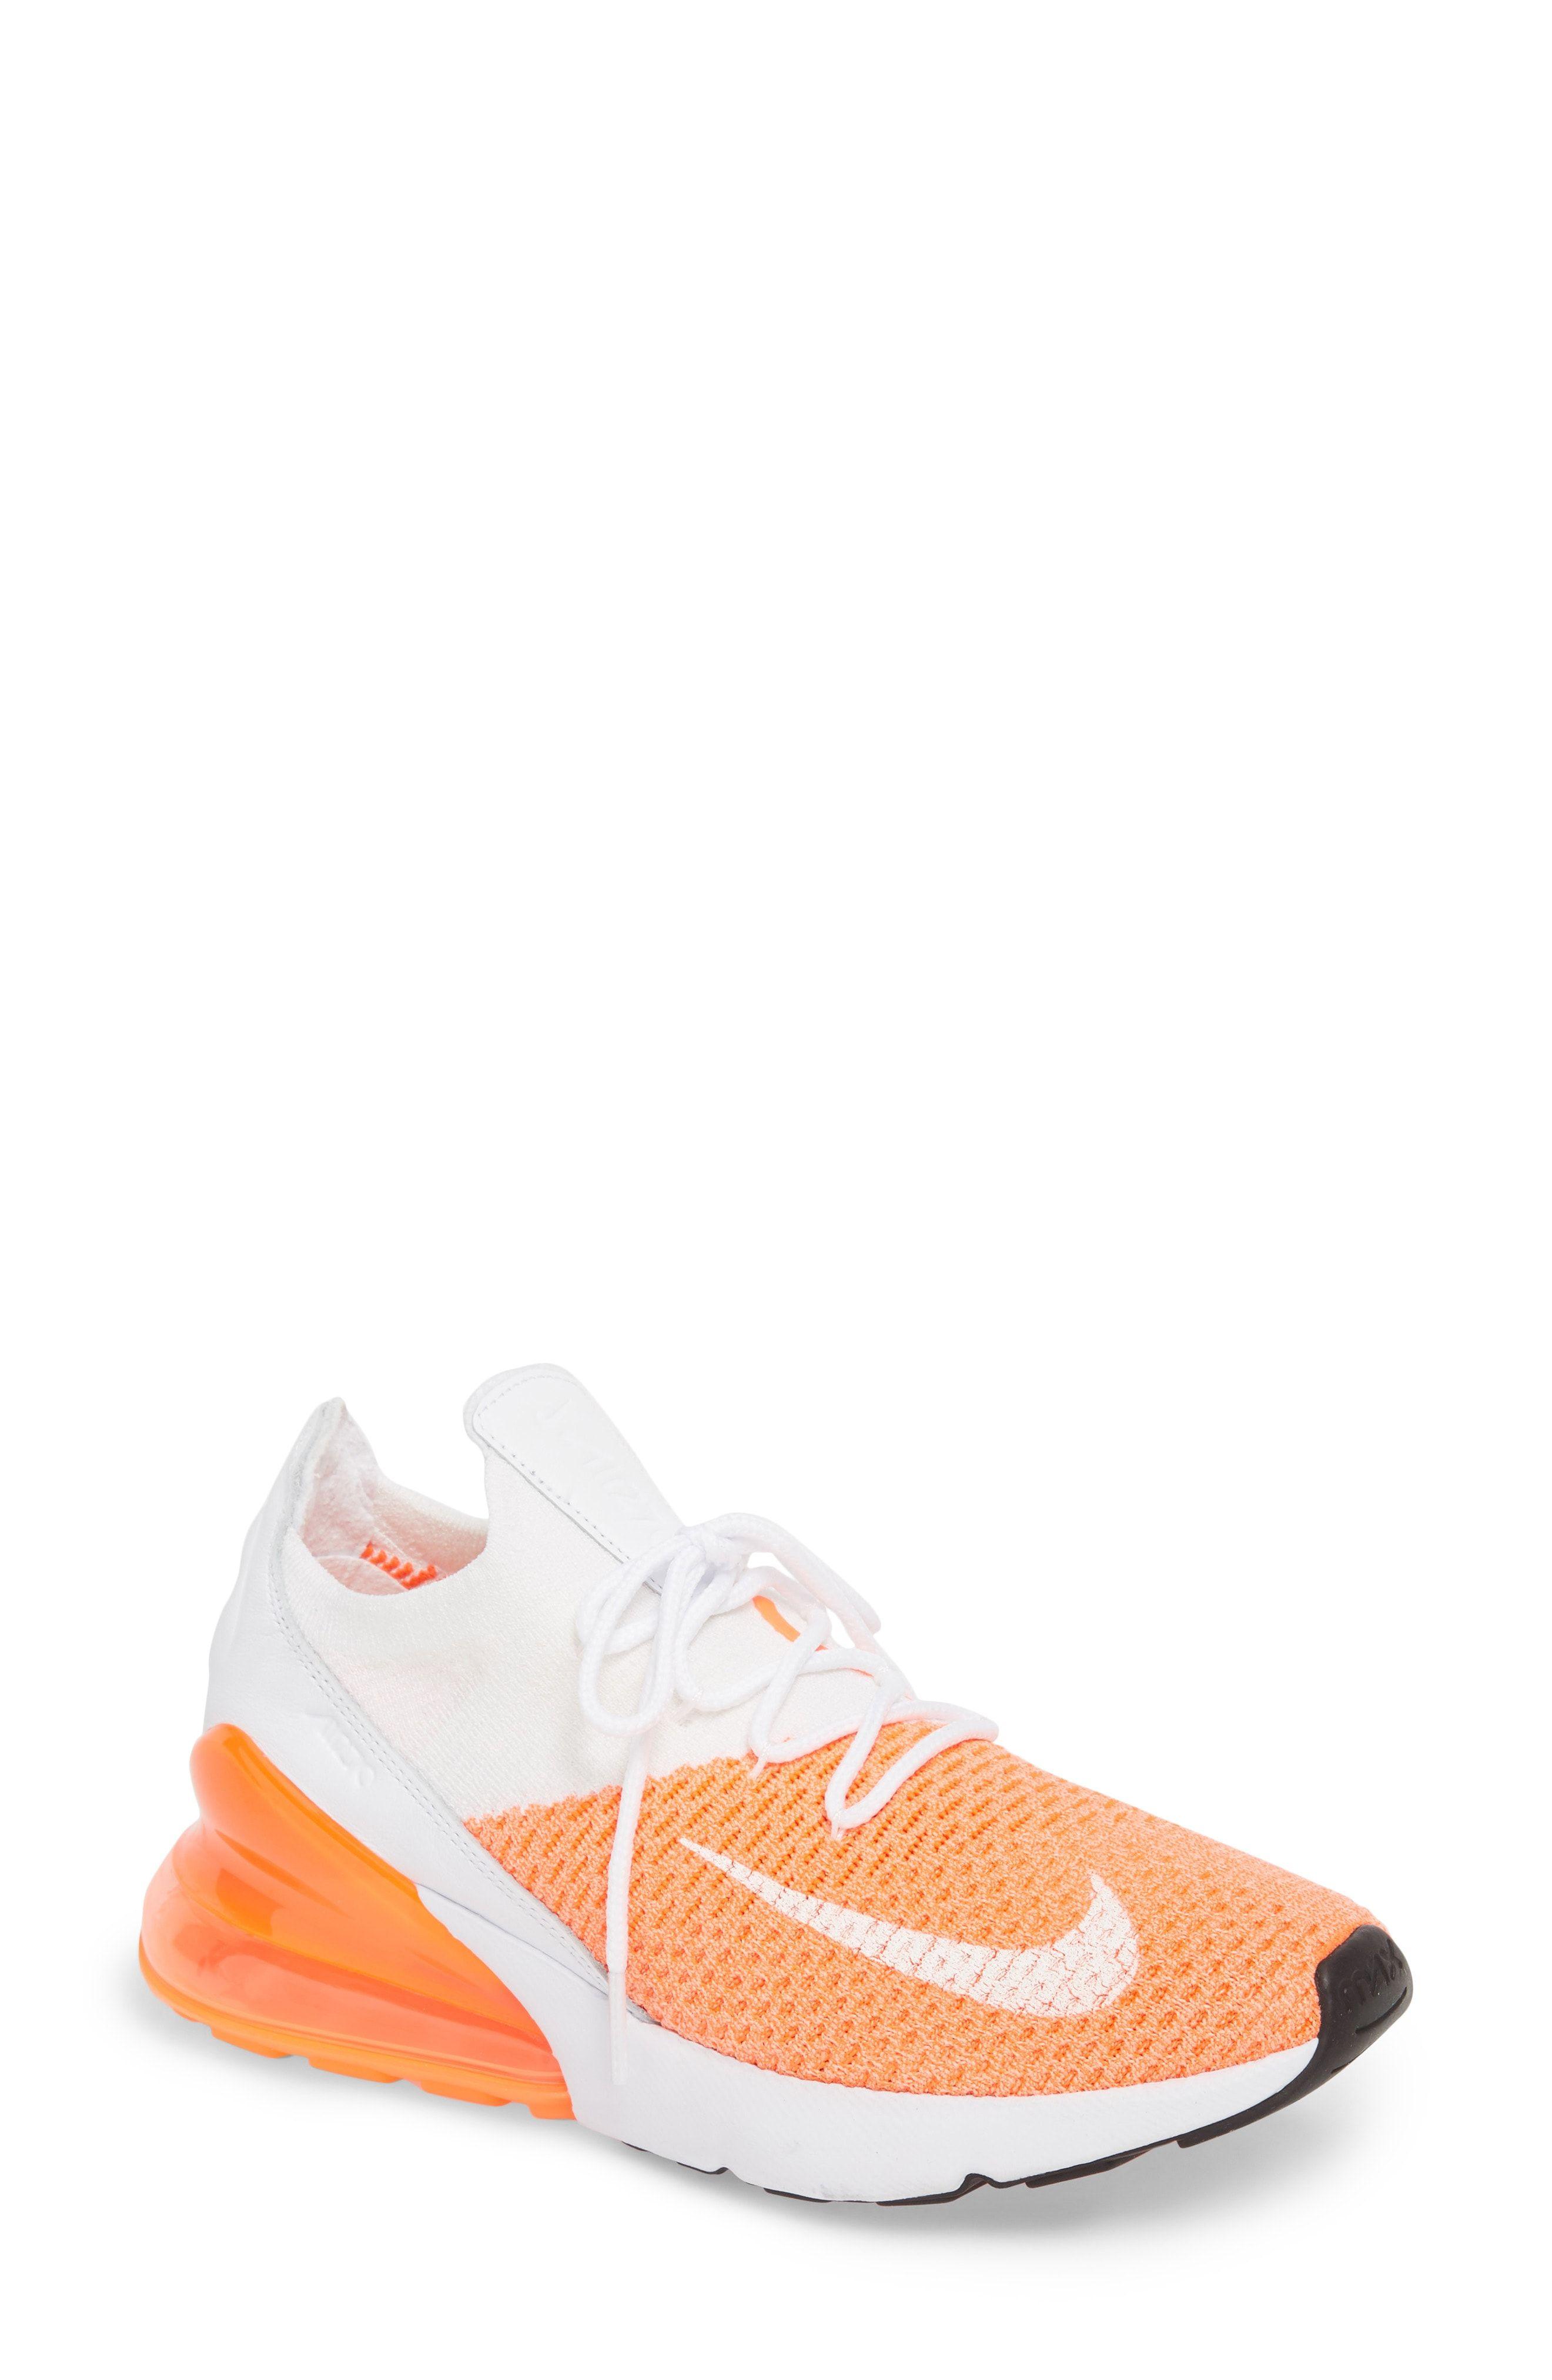 44a847fd2b83 Nike Air Max 270 Flyknit Sneaker (Women)